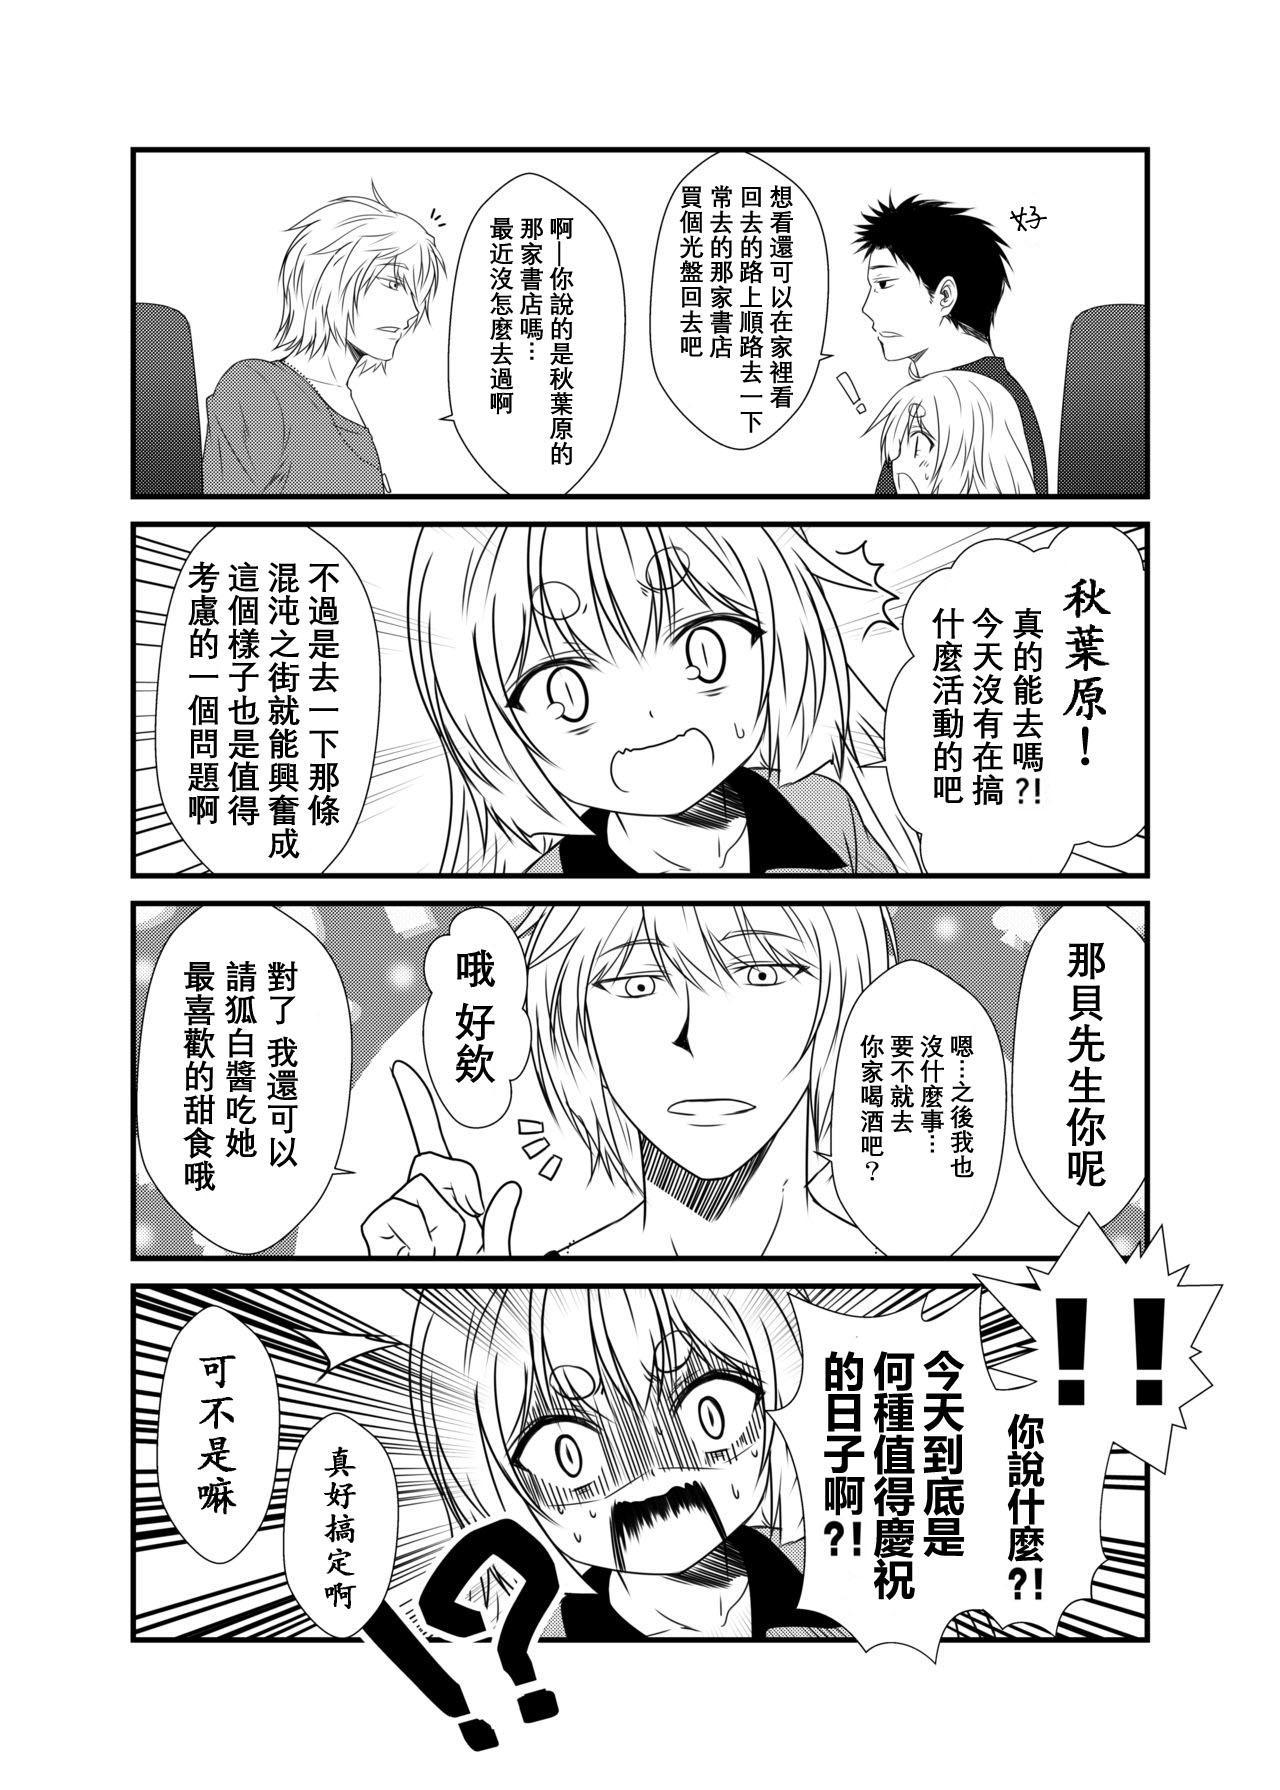 Kohaku Biyori Vol. 5 12